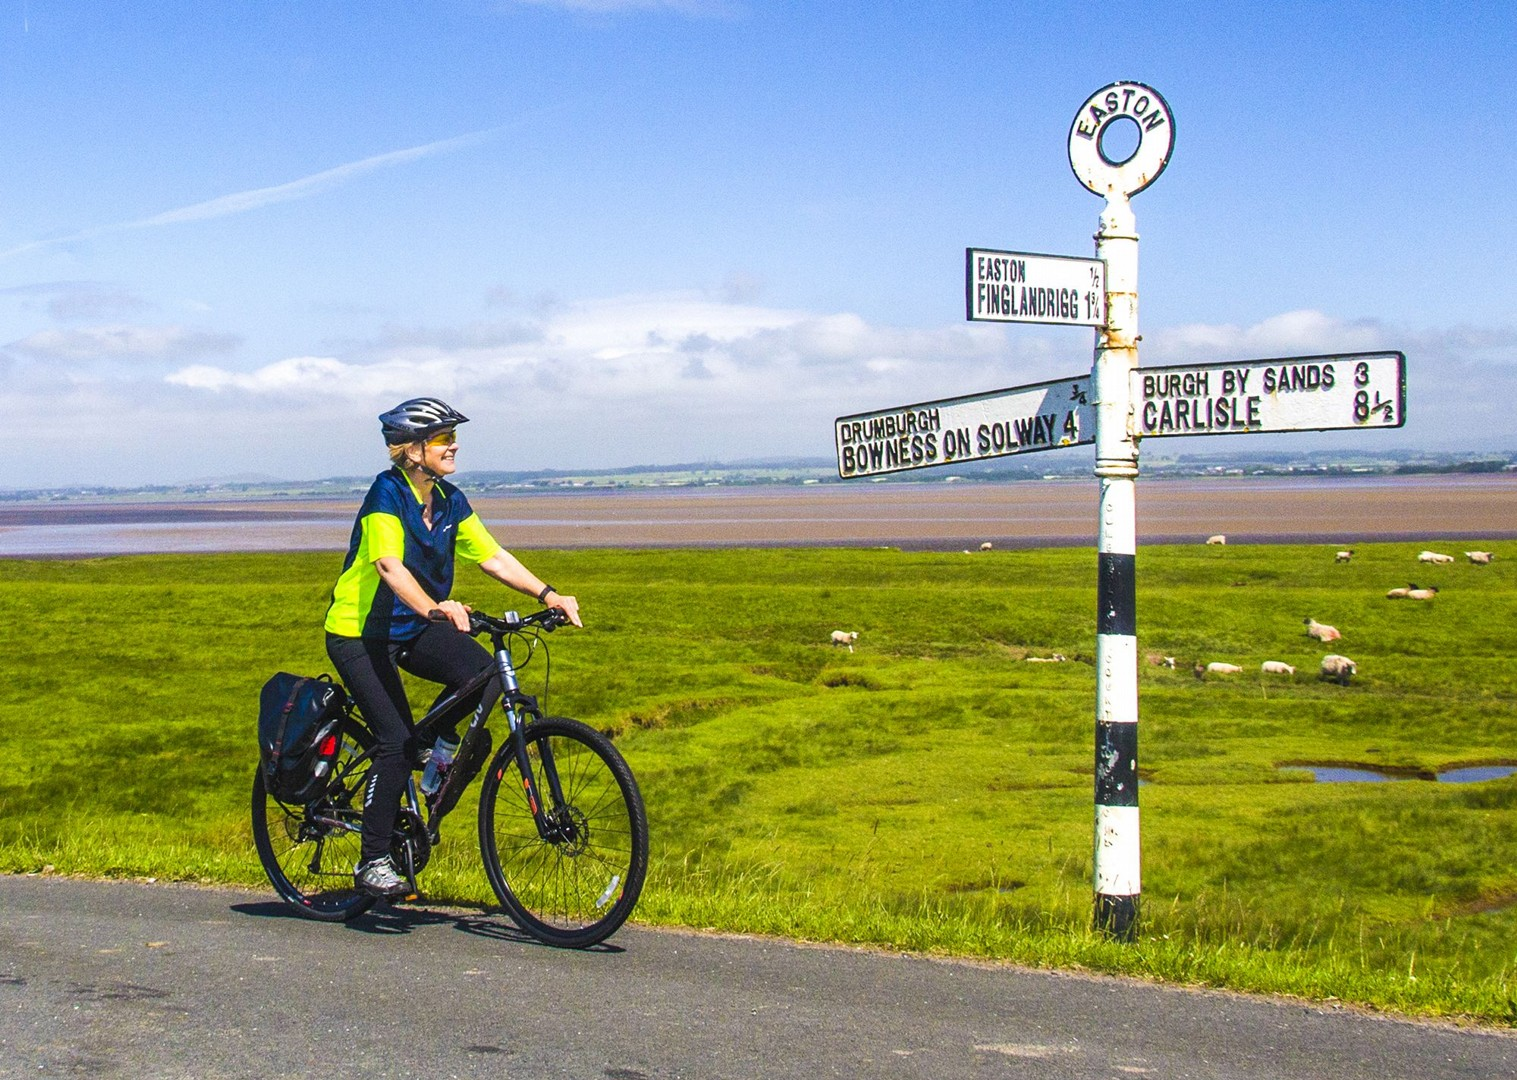 1706_0149-2.jpg - UK - Hadrian's Cycleway - 6 Days Cycling - Self-Guided Leisure Cycling Holiday - Leisure Cycling